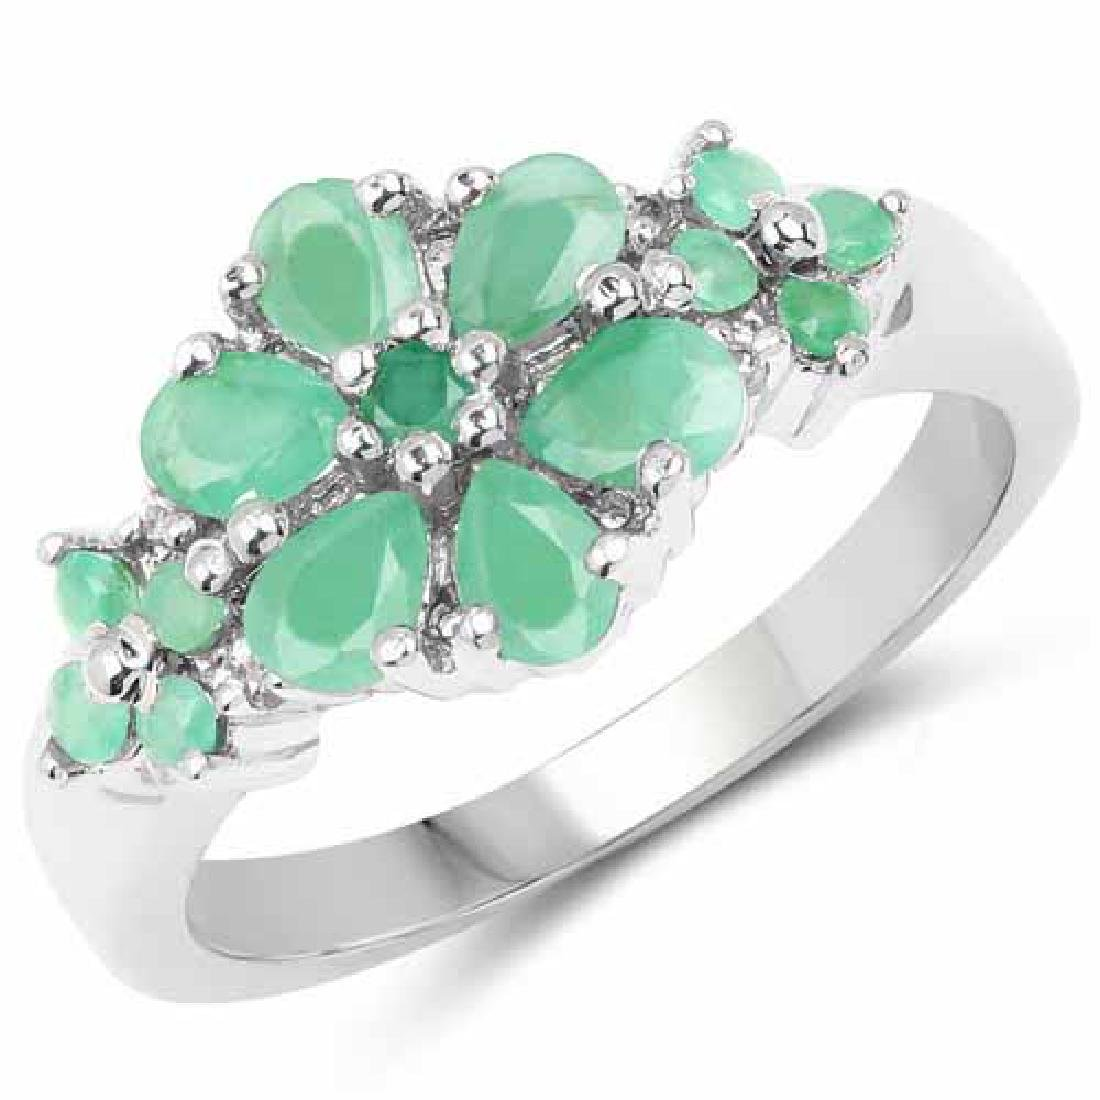 1.11 Carat Genuine Emerald and White Topaz .925 Sterlin